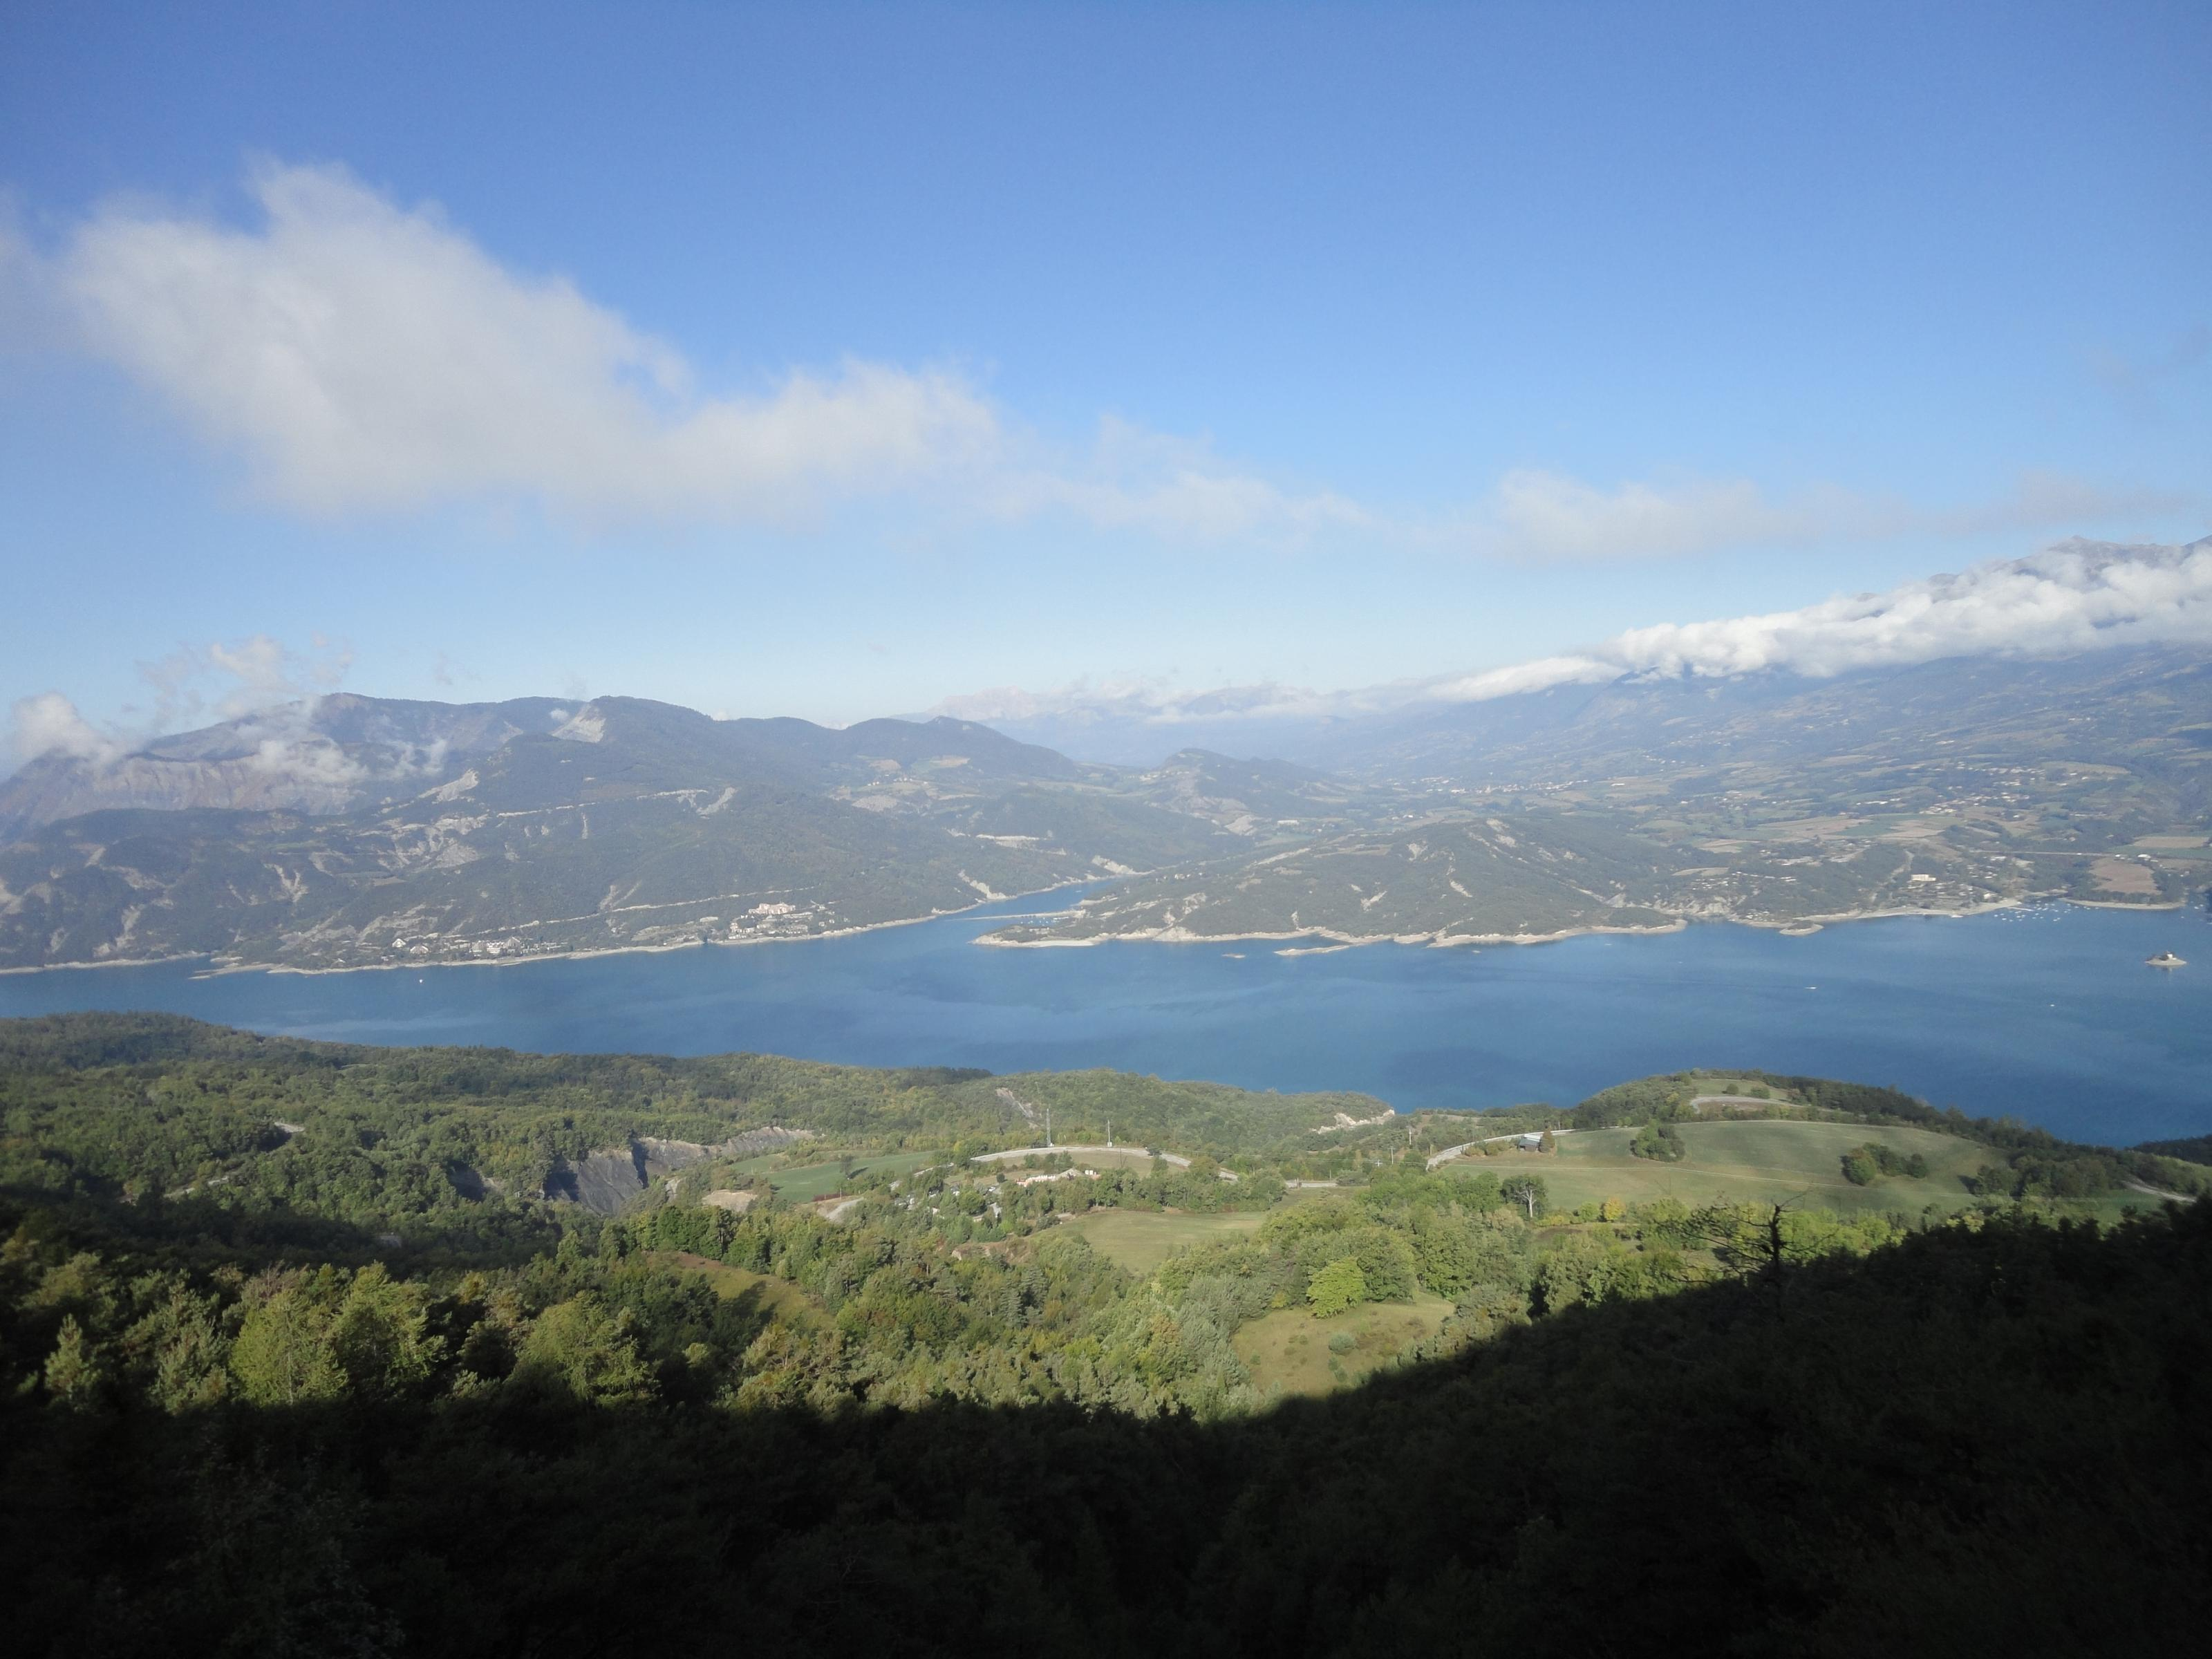 lac-de-serre-poncon-25.9.-14.jpg